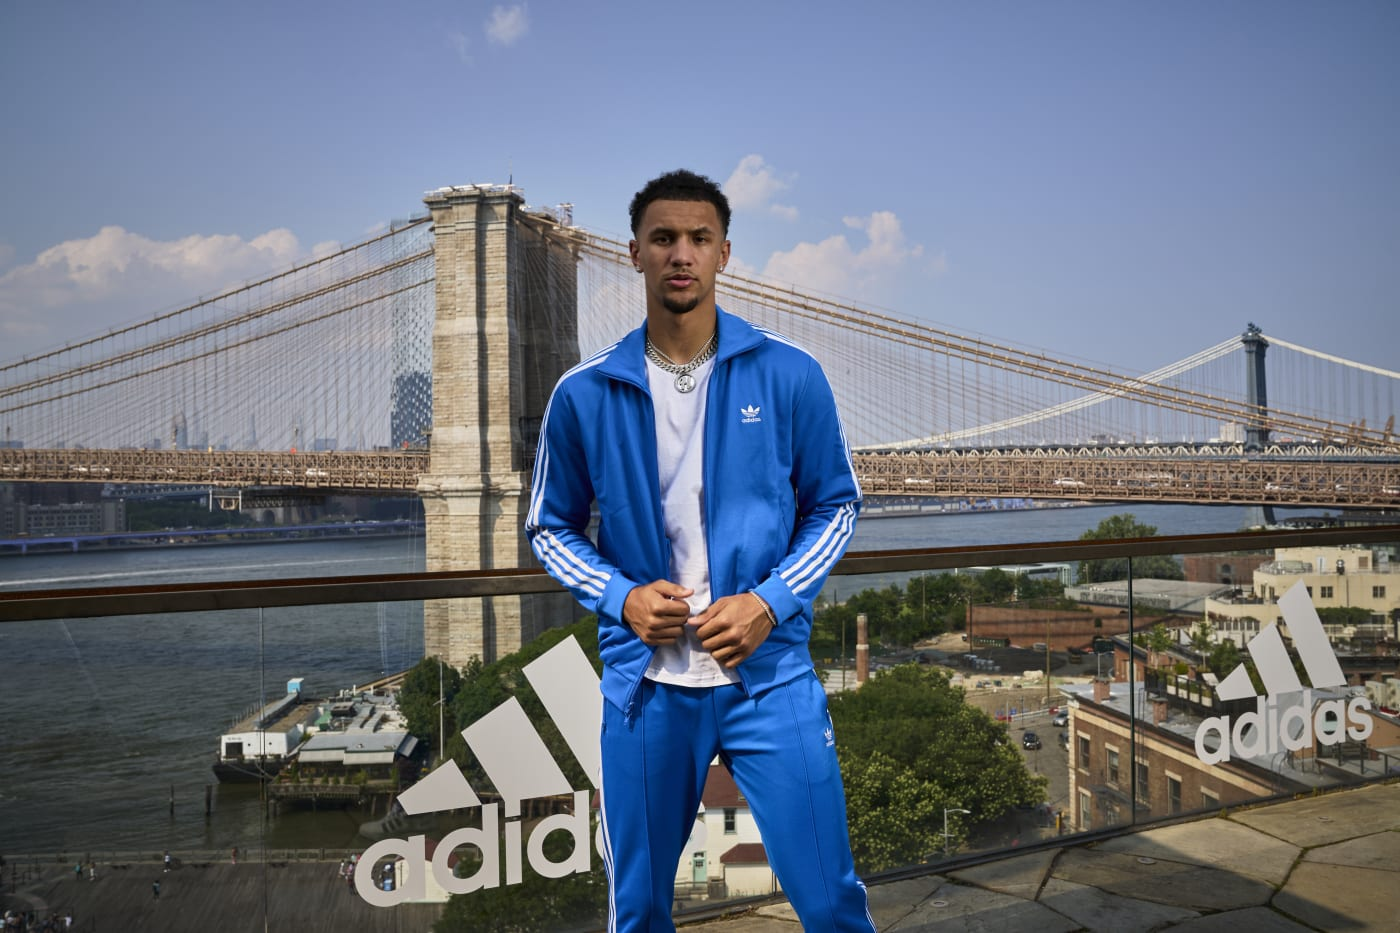 Jalen Suggs Adidas Brooklyn Bridge 1 2021